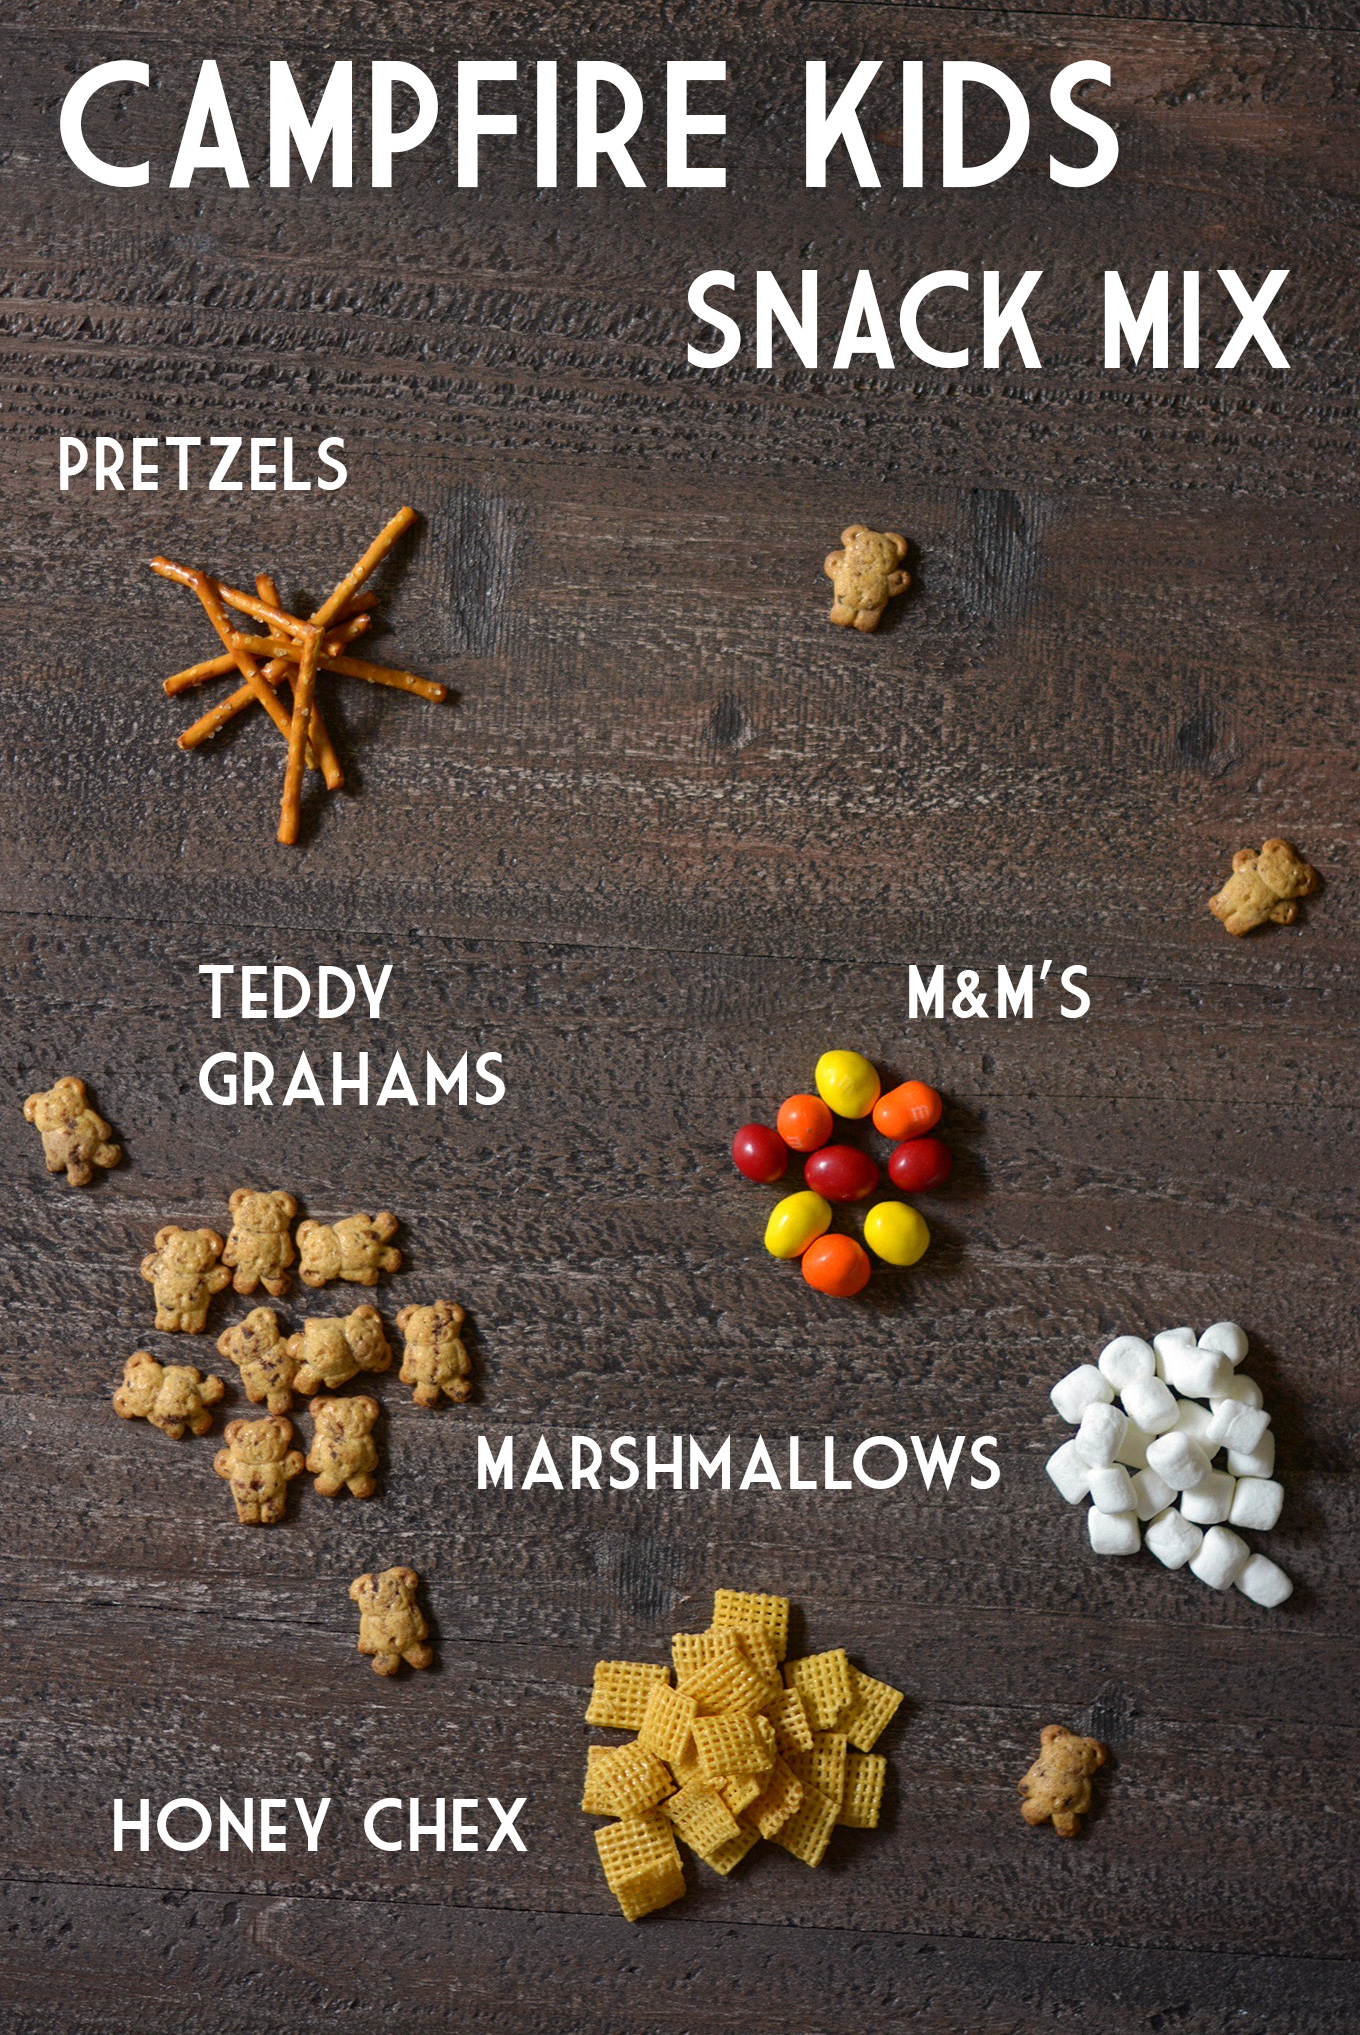 Campfire Kids Snack Mix